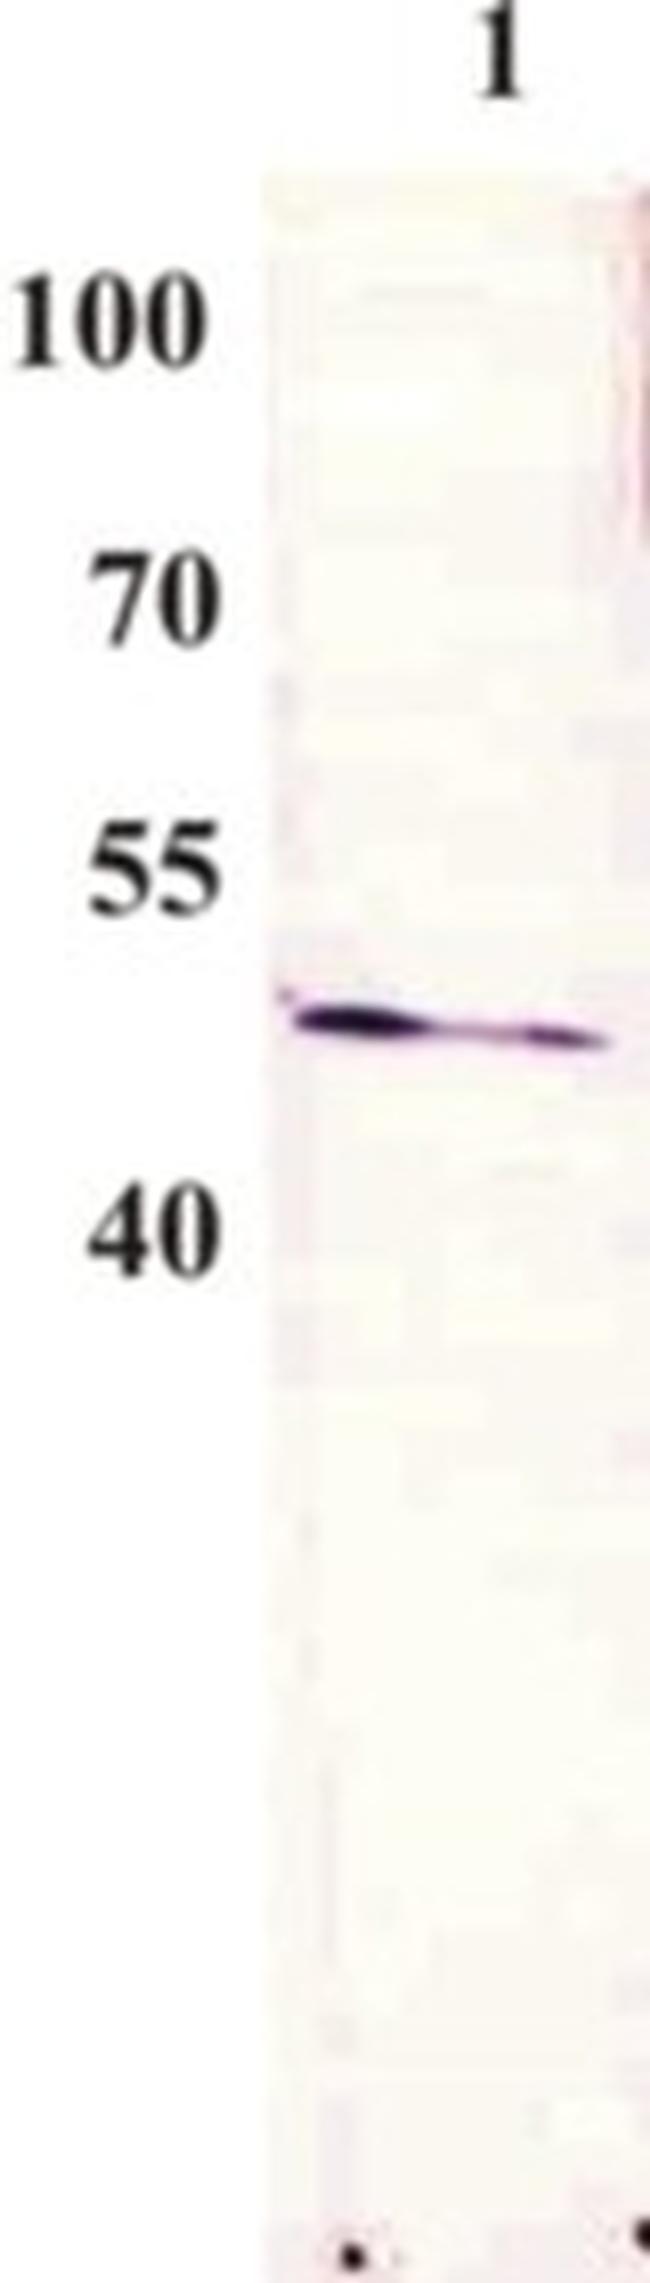 Bovine Papilloma Virus Type 1 E2 Antibody (MA1-71533) in Western Blot